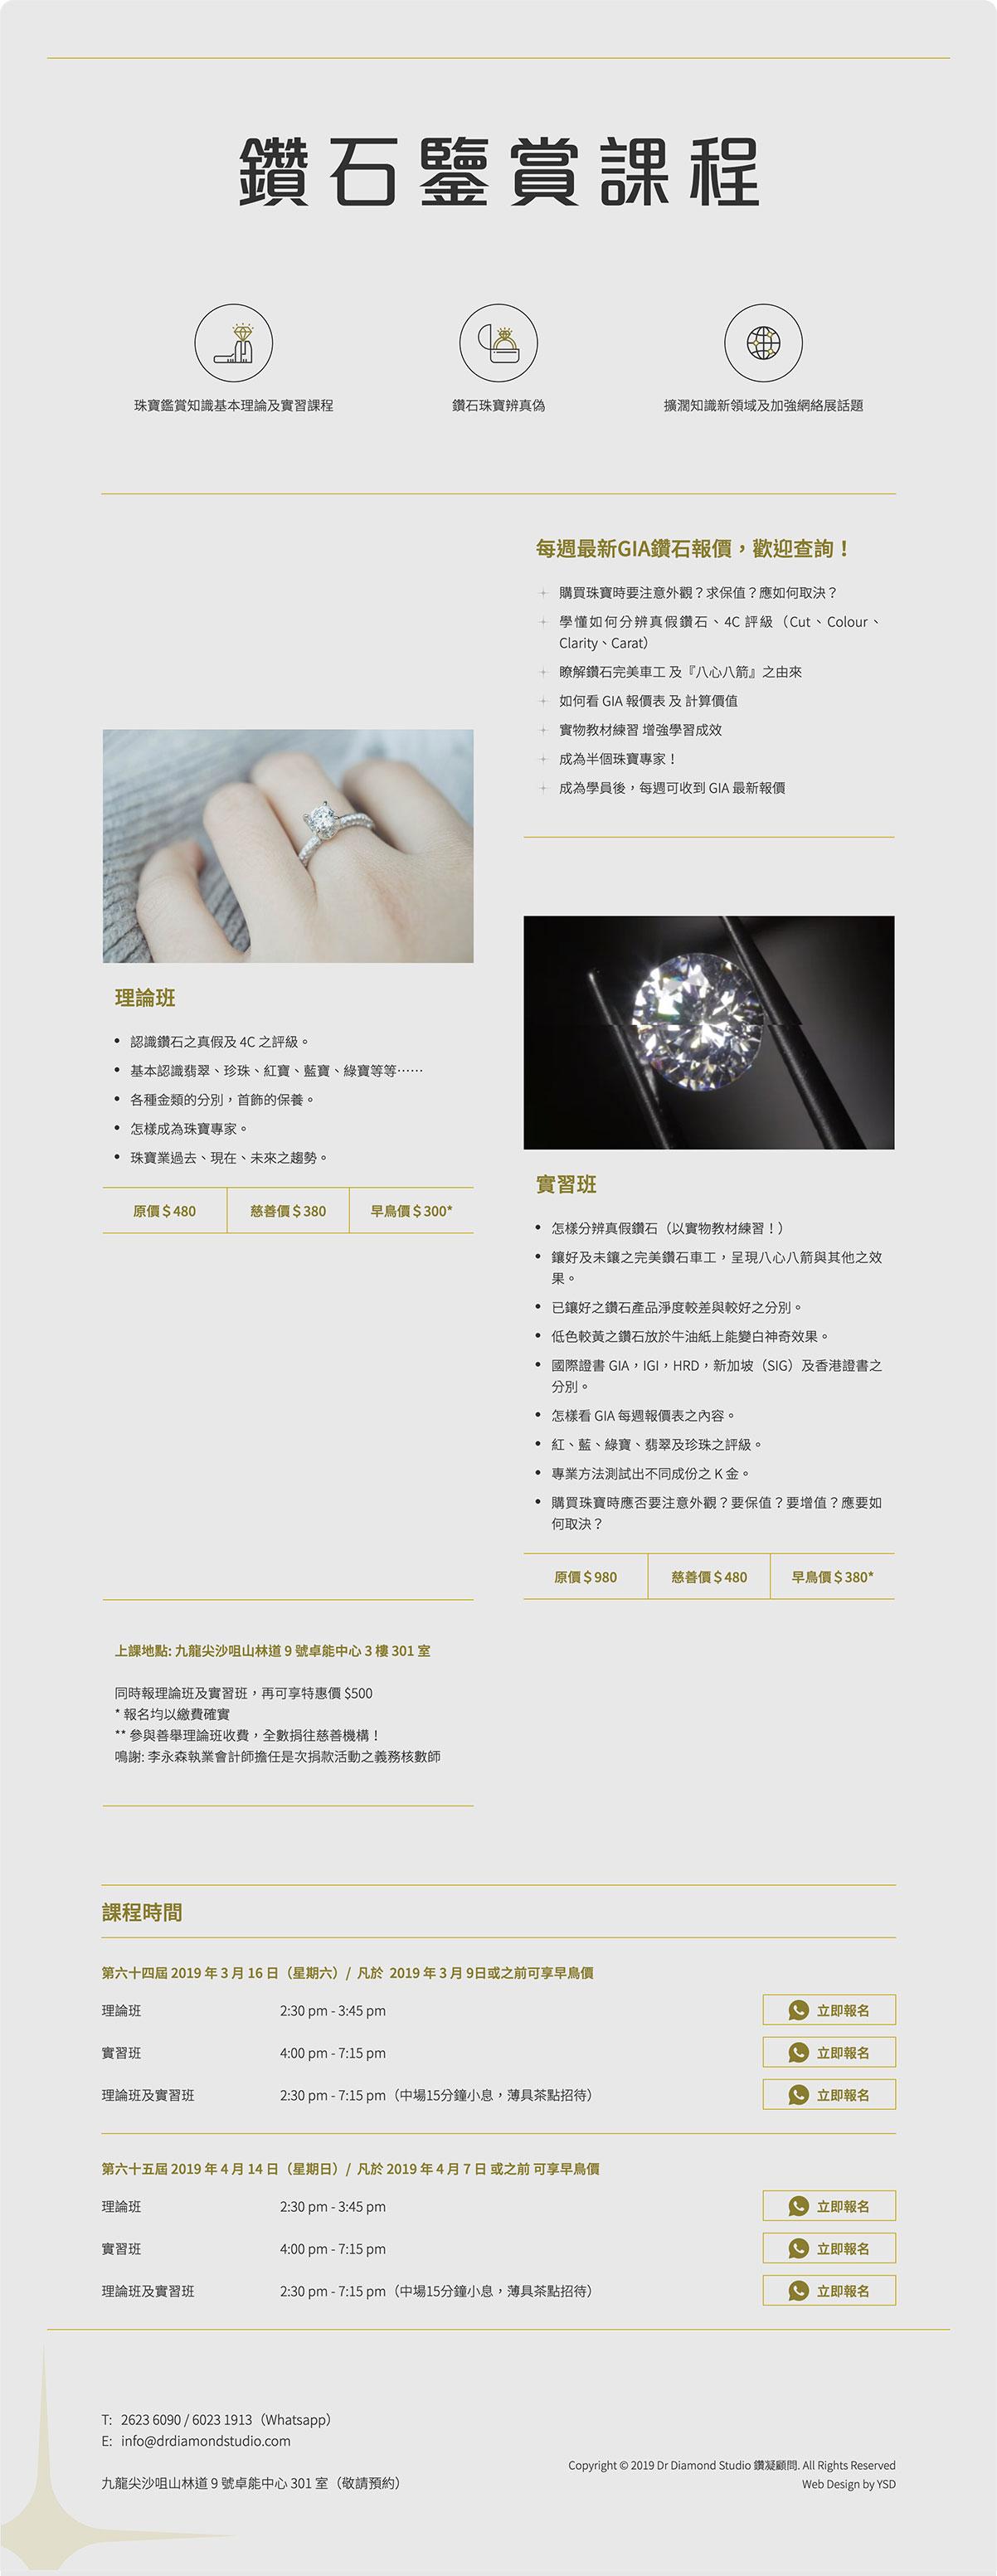 drdiamondstudio-detailpage-3.jpg